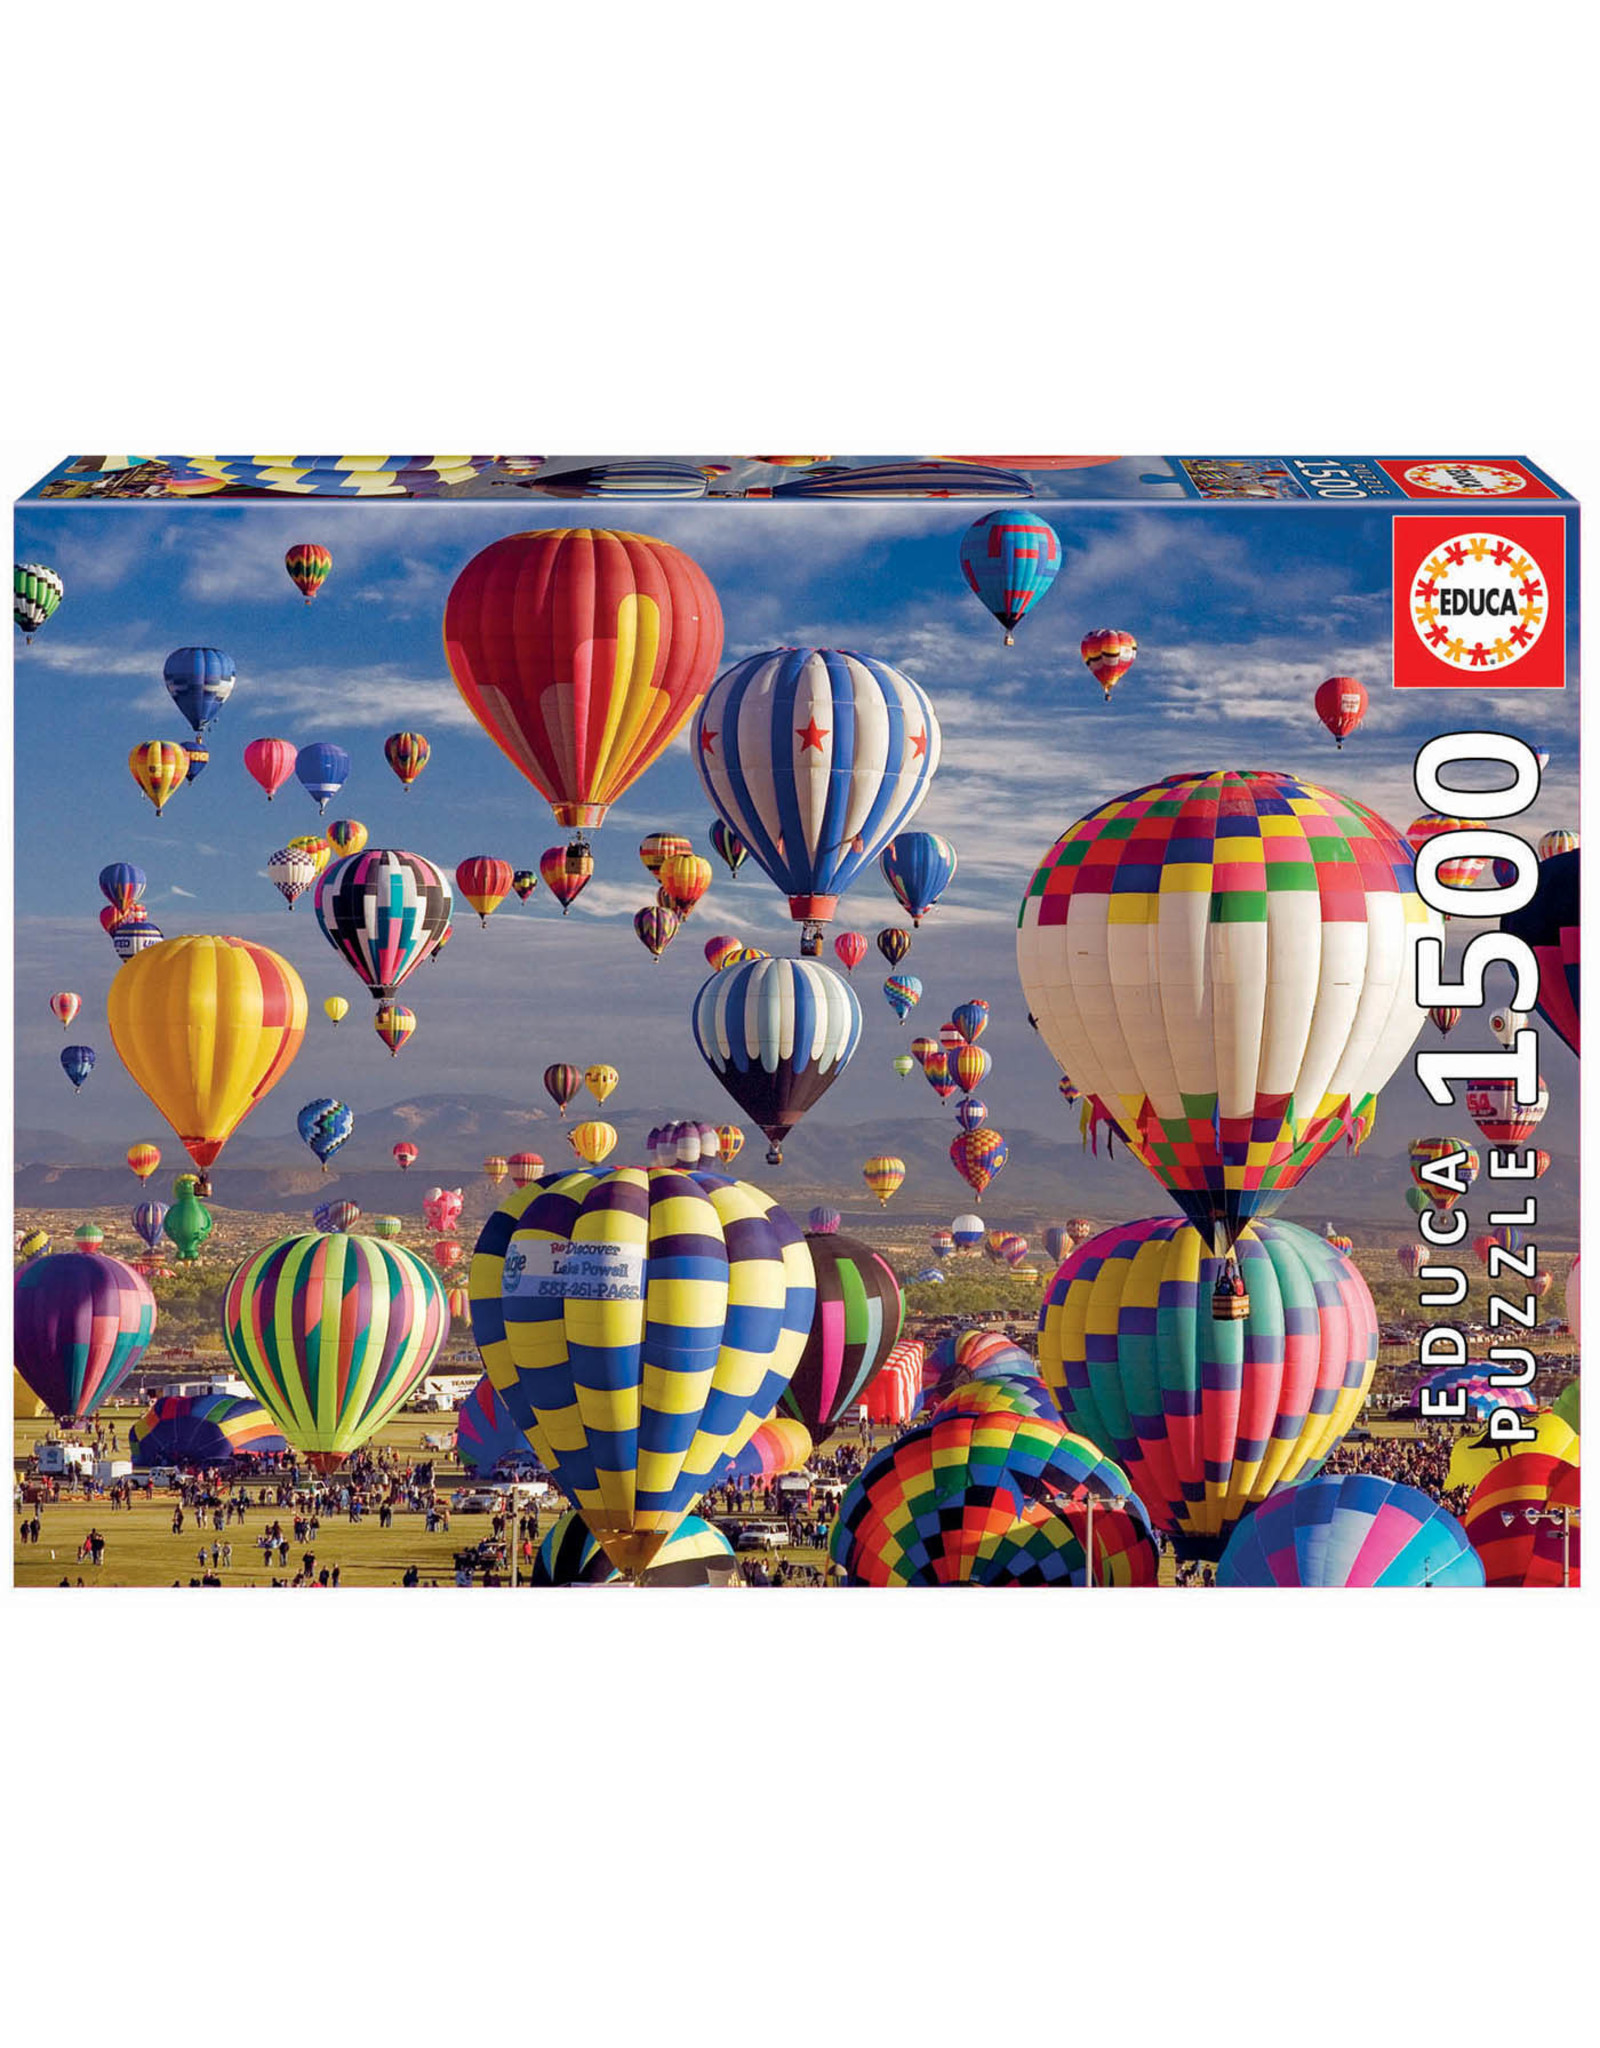 Educa Puzzles Hot Air Balloons 1500pc